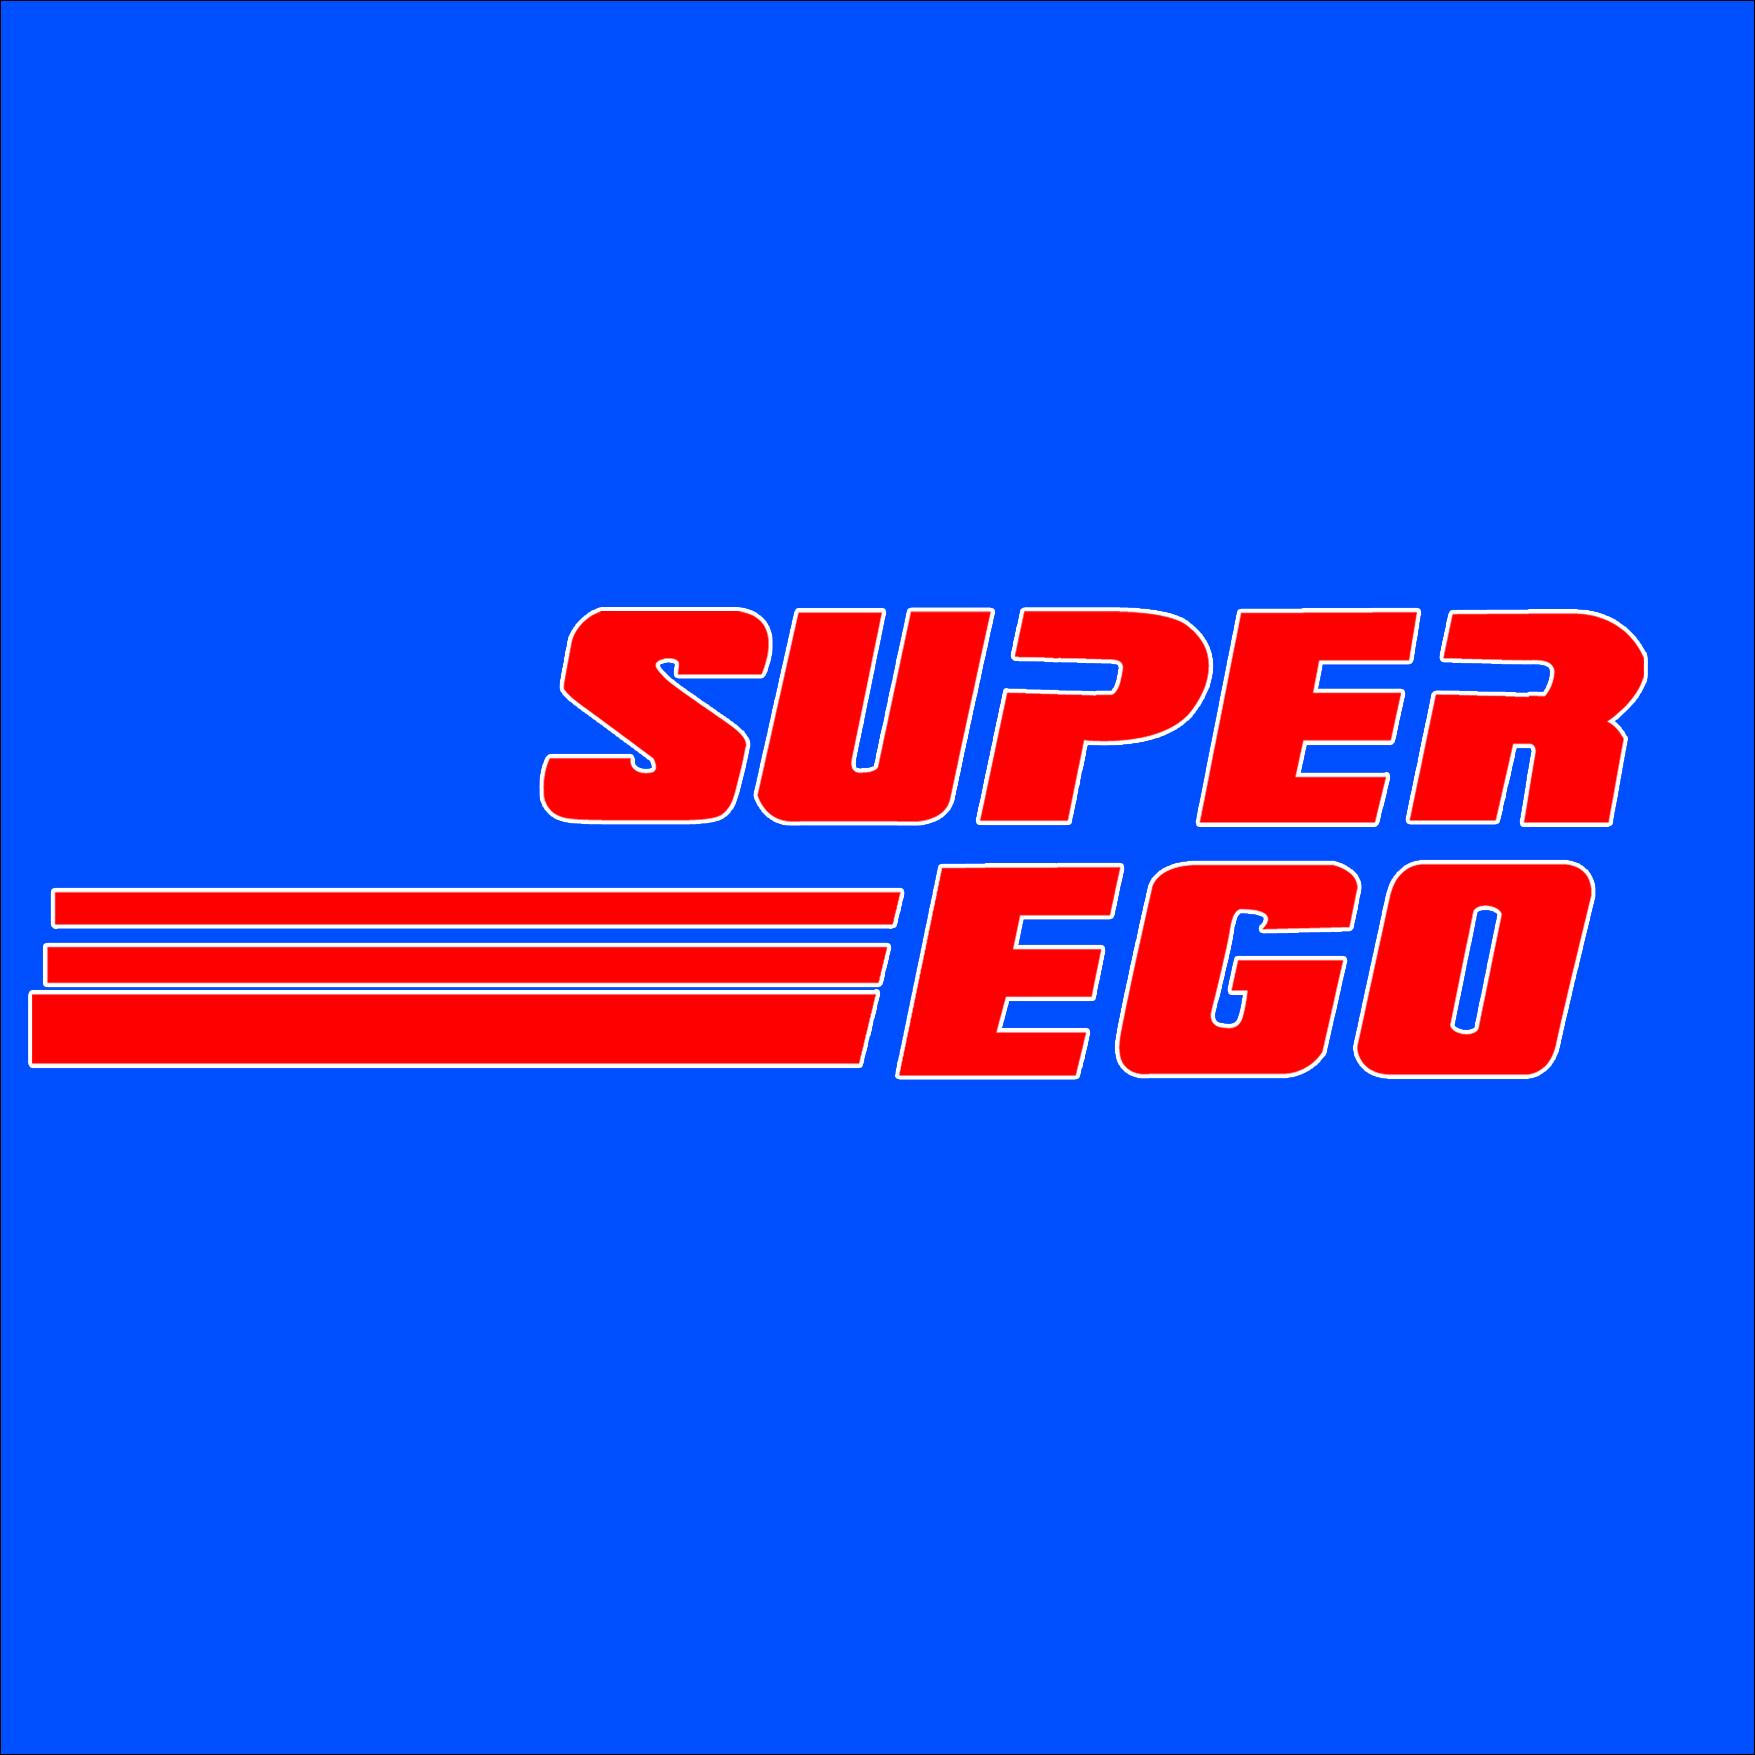 Super Ego